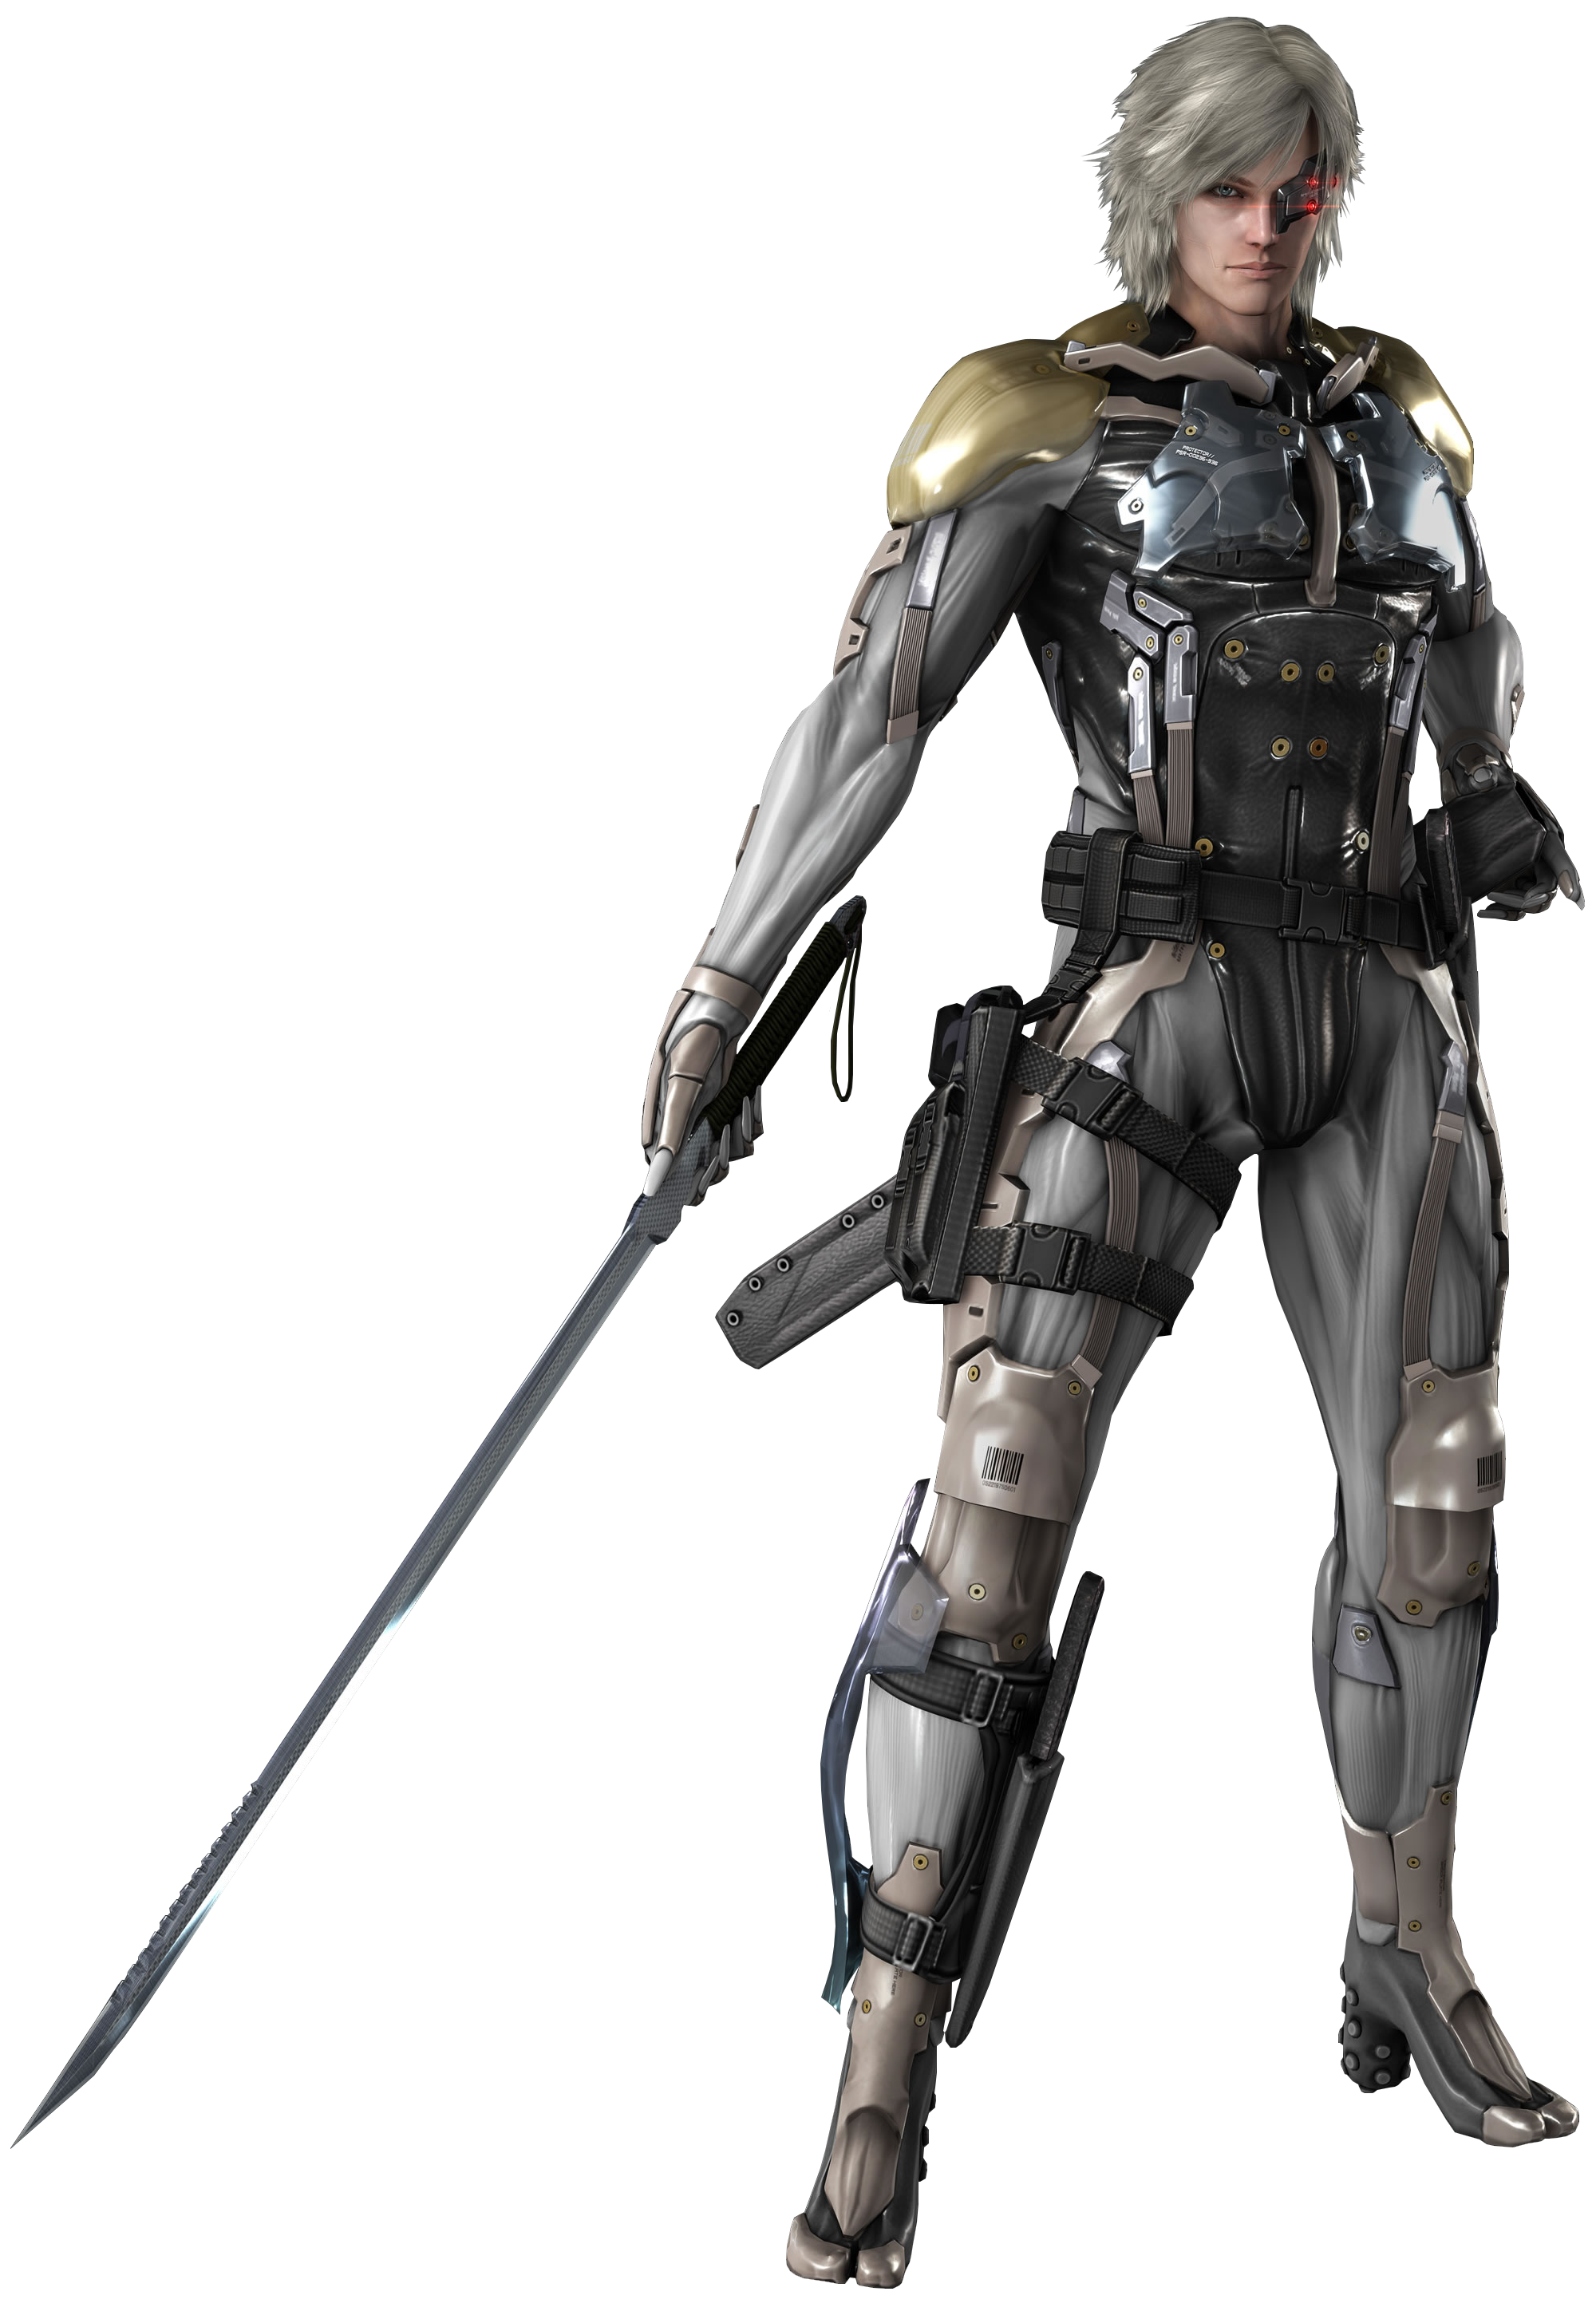 Http Www Deviantart Com Art Metal Gear Rising Revengeance Raiden Render 351480903 Metal Gear Rising Metal Gear Metal Gear Solid